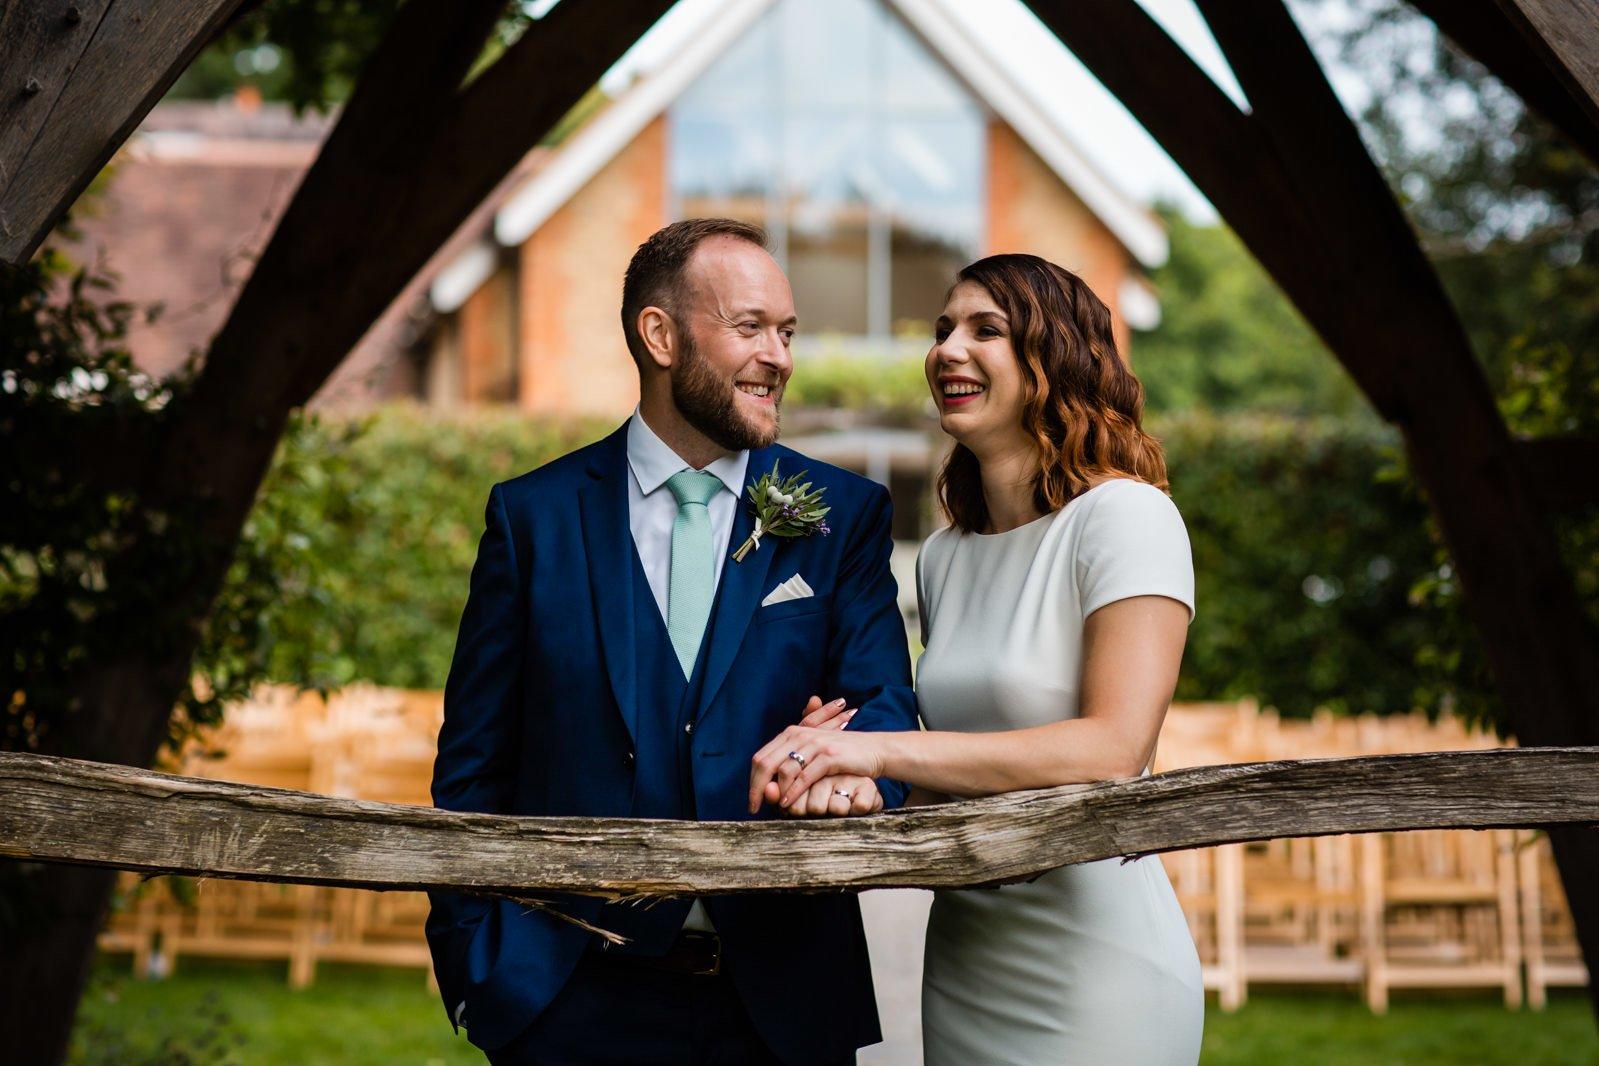 Millbridge Court Wedding - stunning summer wedding - wedding photography 79